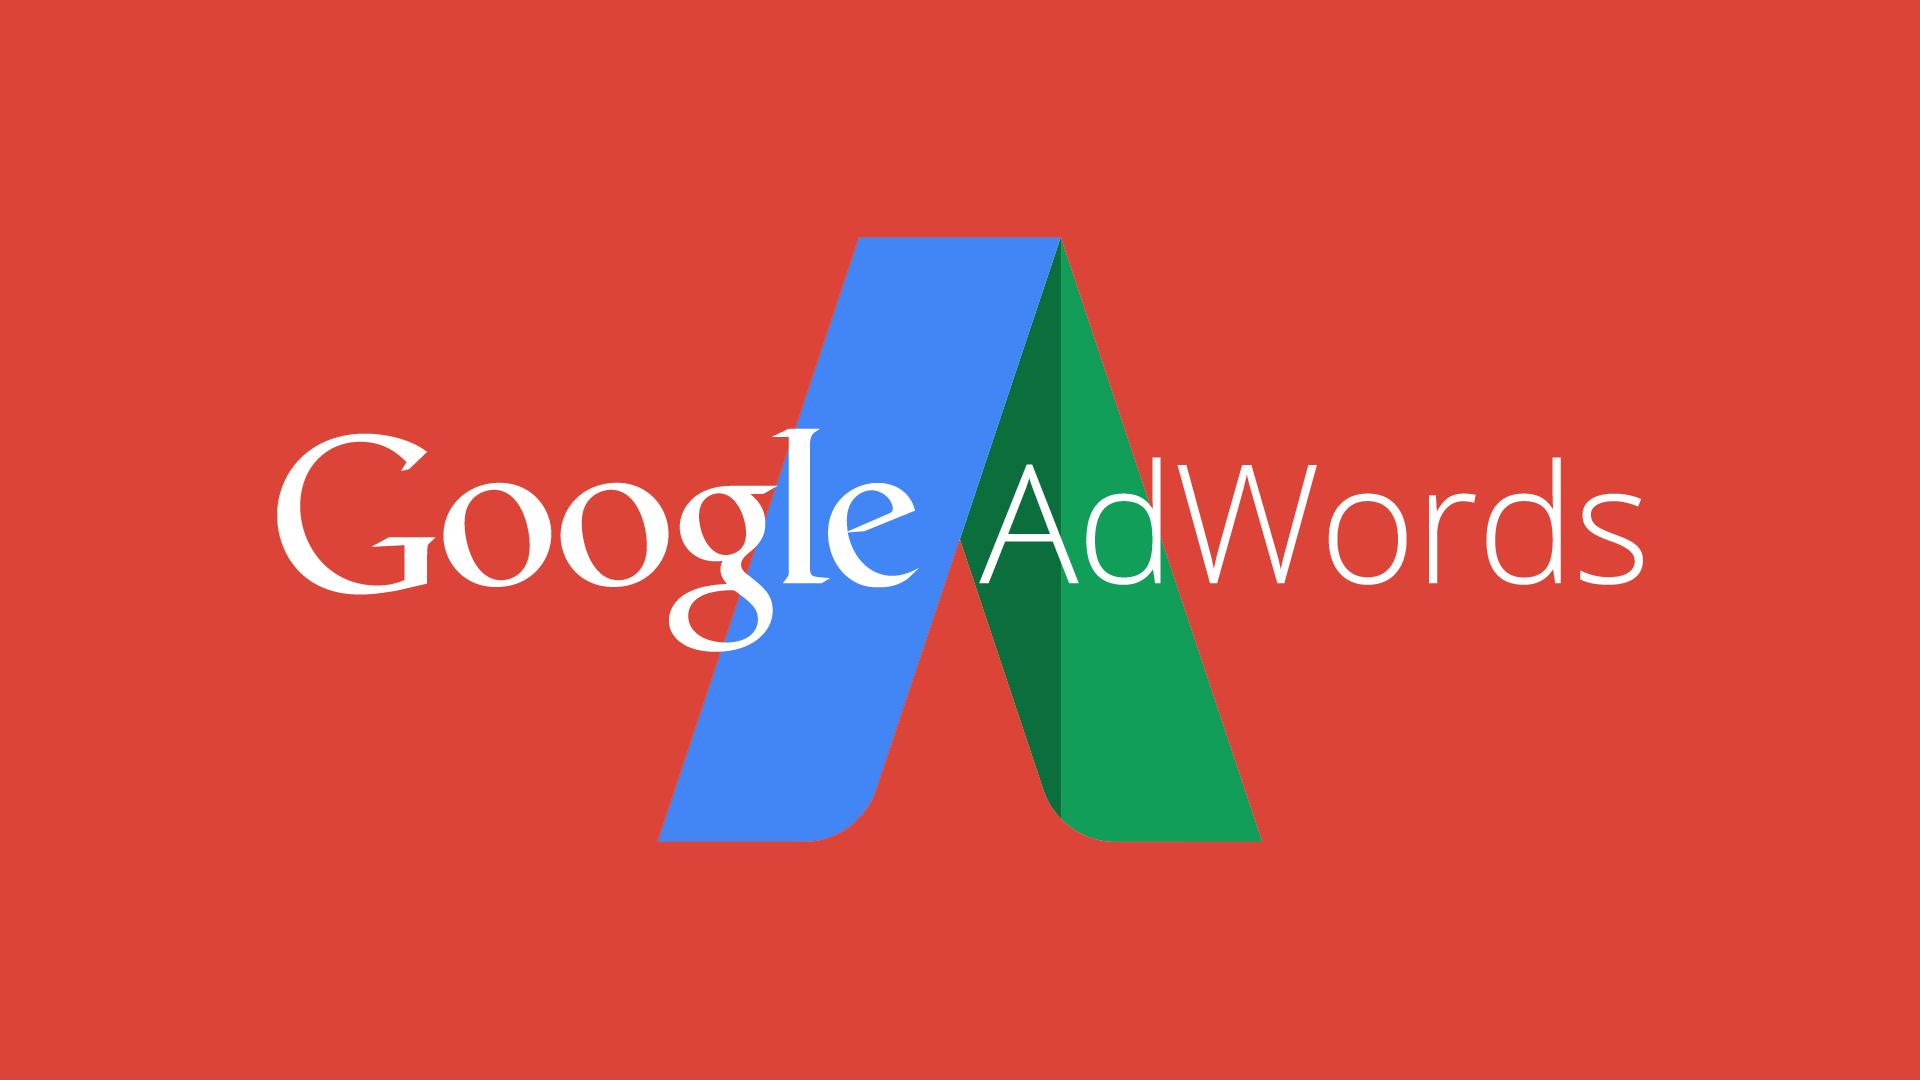 google adwords red logo